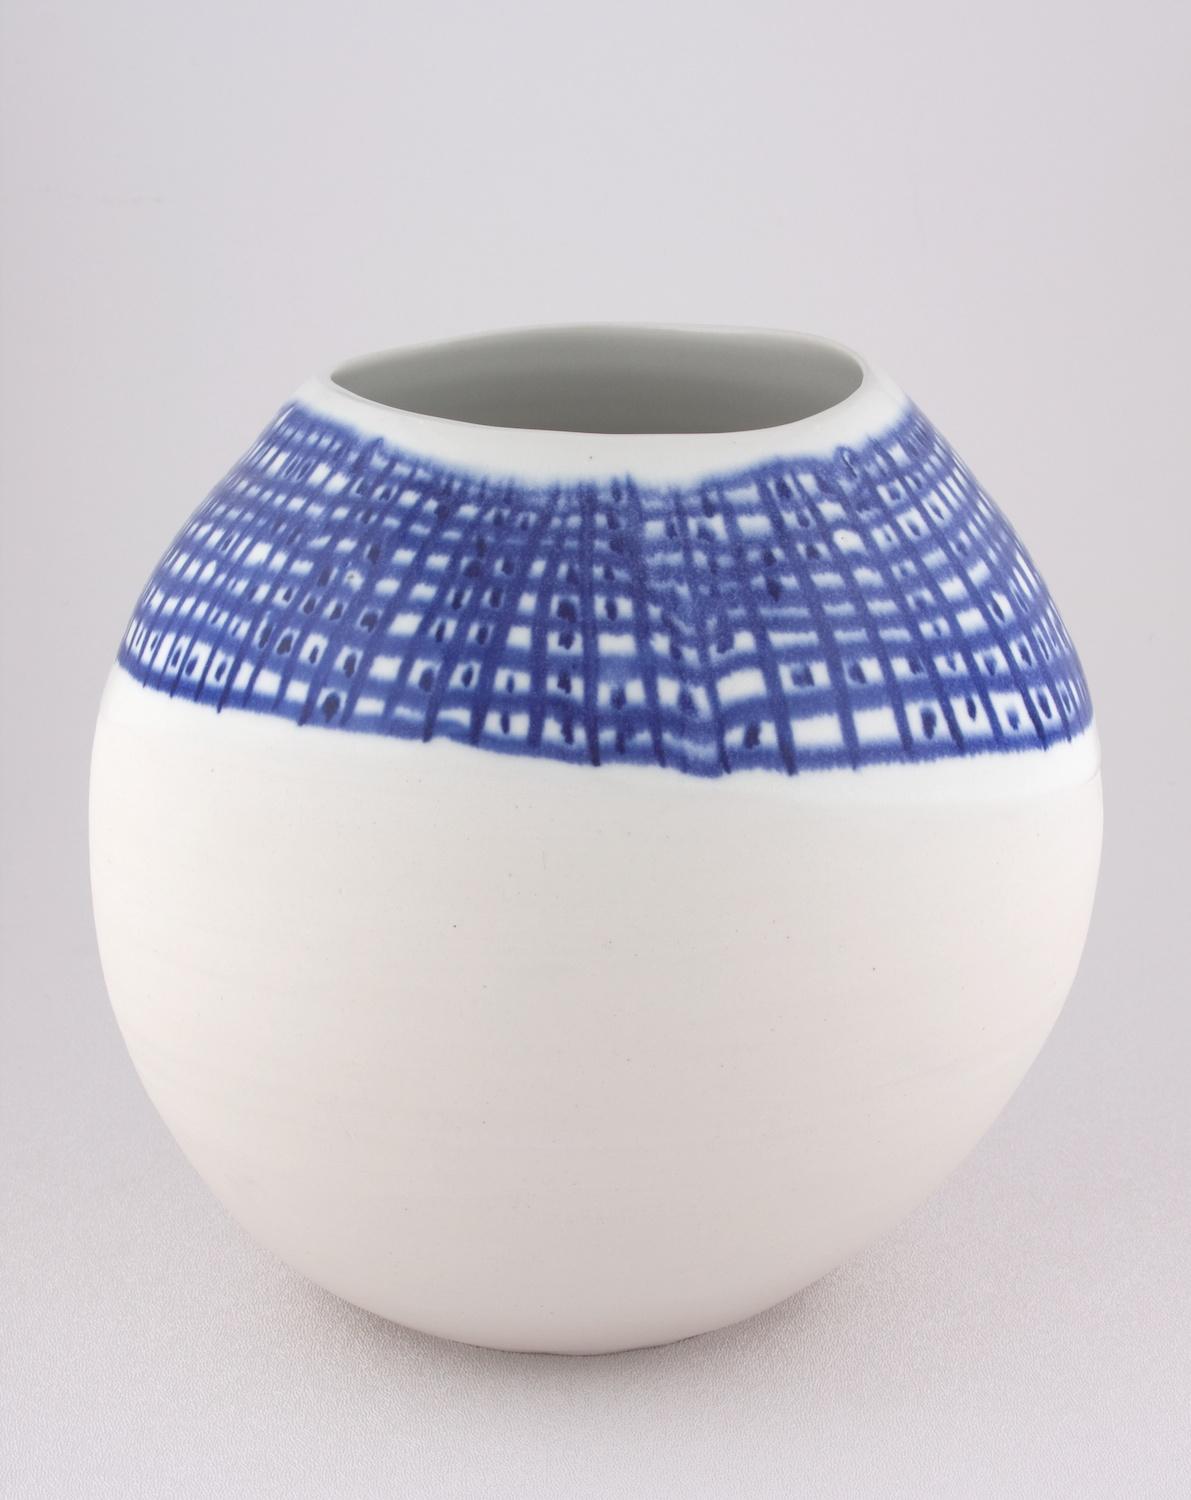 Shio Kusaka  Untitled (1/3 blue grid)  2009 Porcelain 8h x 8 ½w x 8 ½d in K060